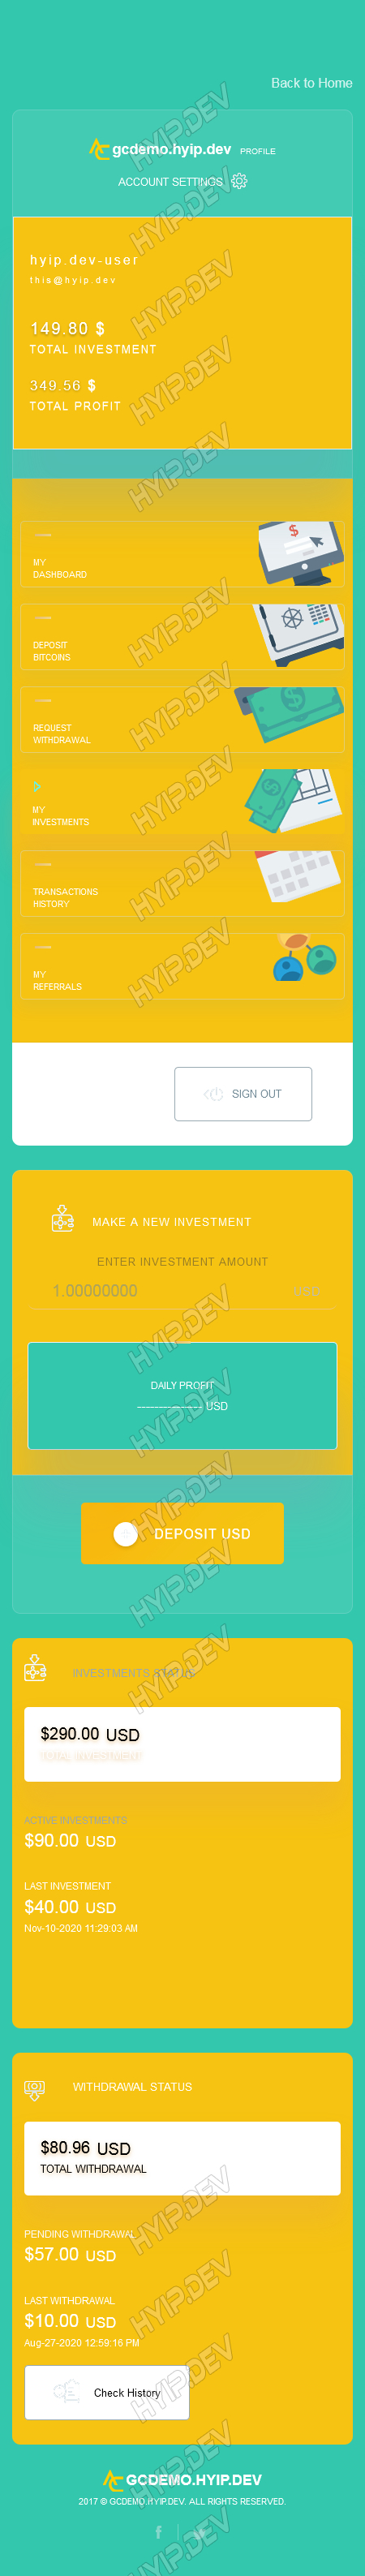 goldcoders hyip template no. 181, responsive page screenshot